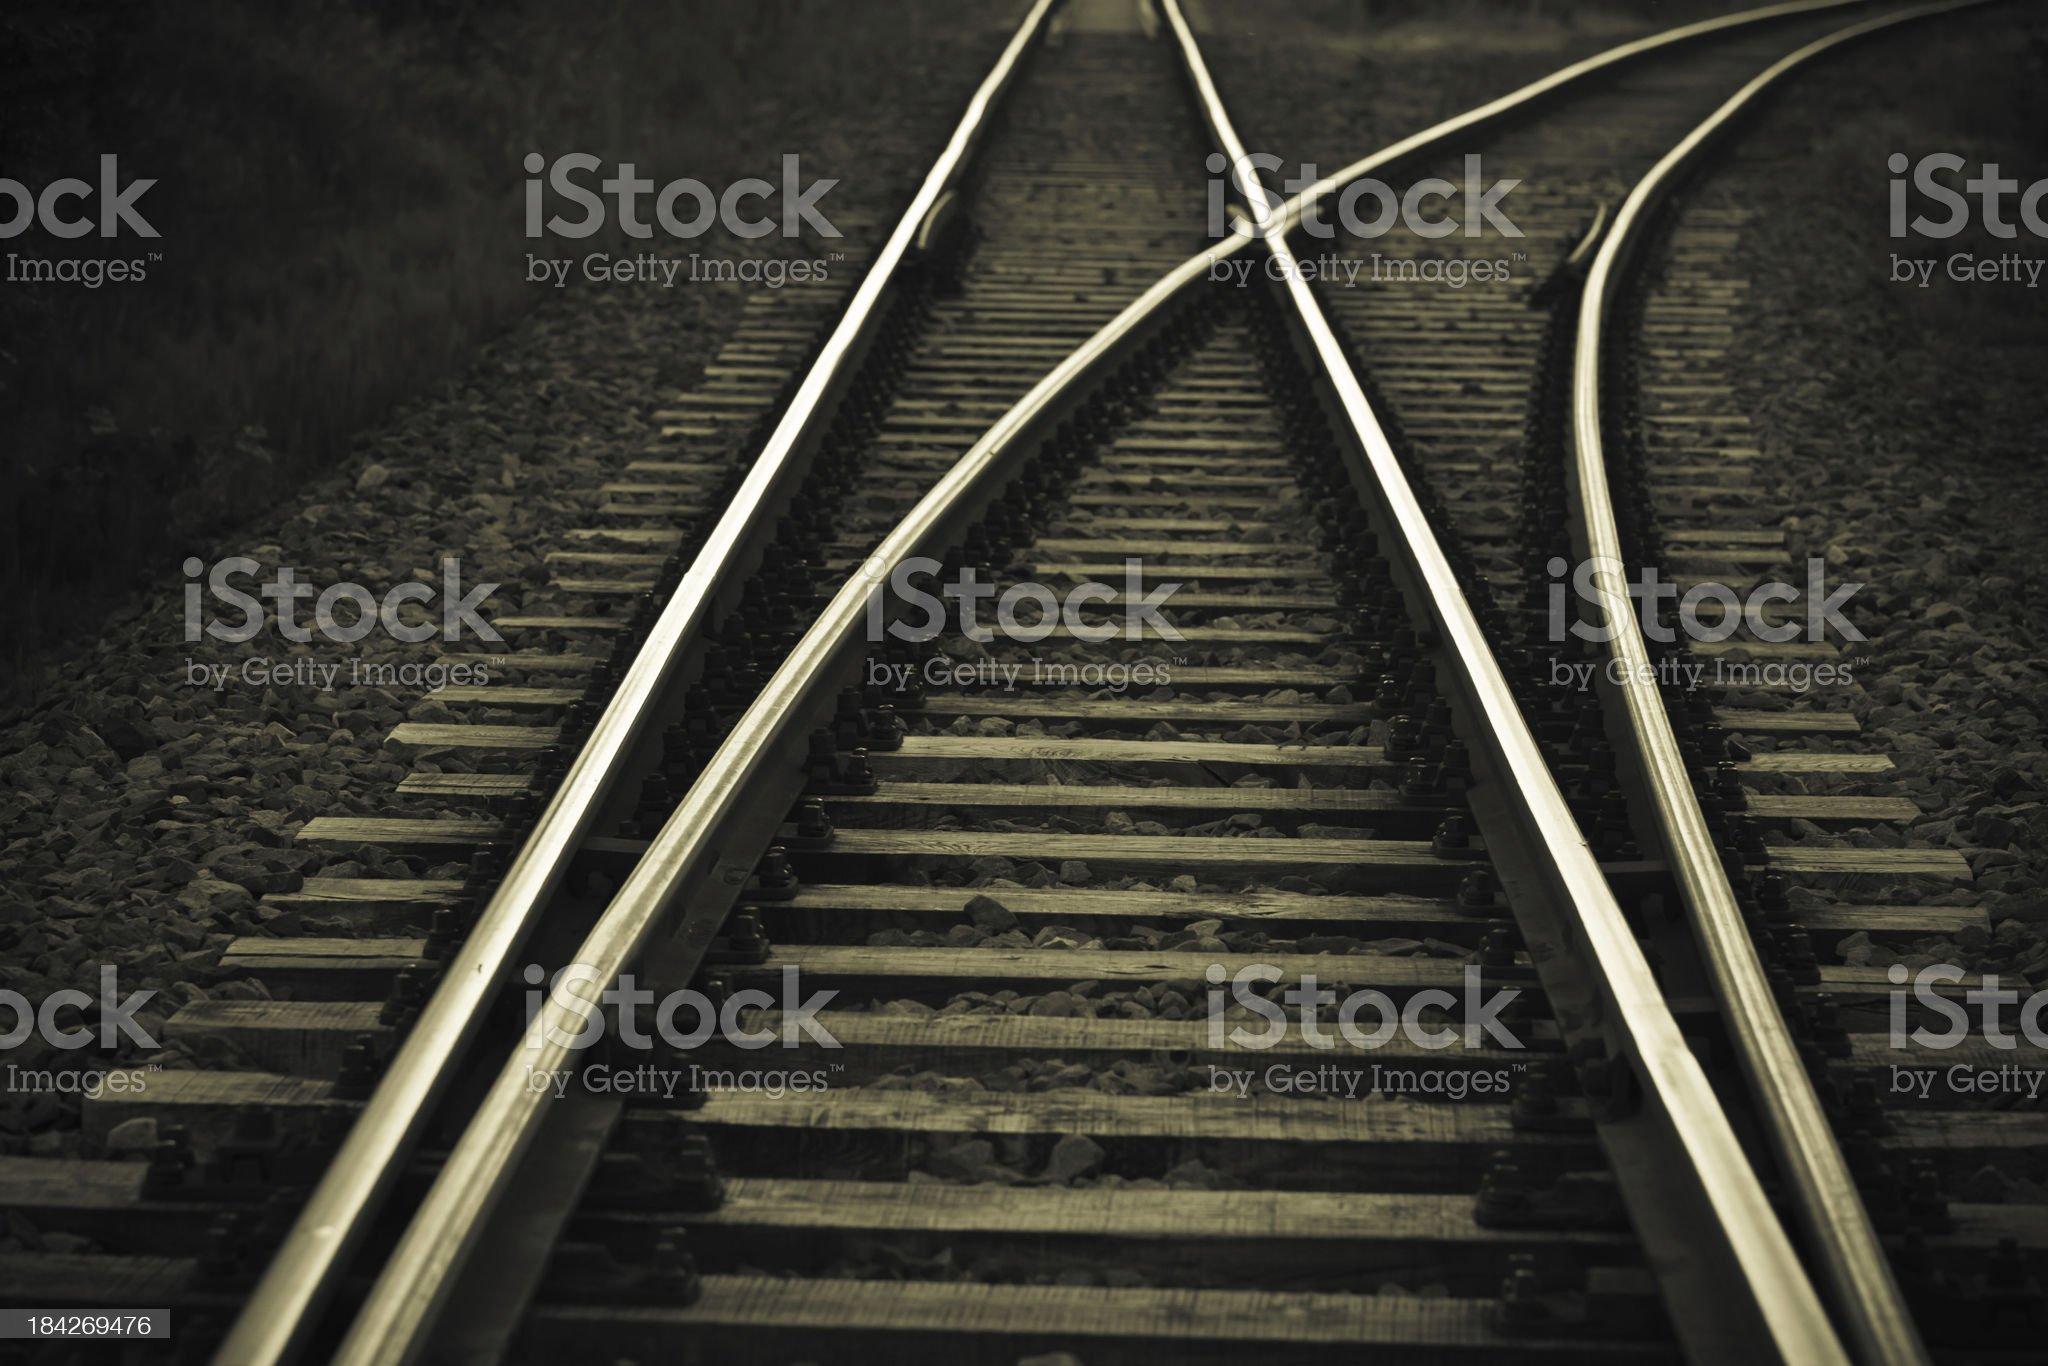 Railroad track royalty-free stock photo